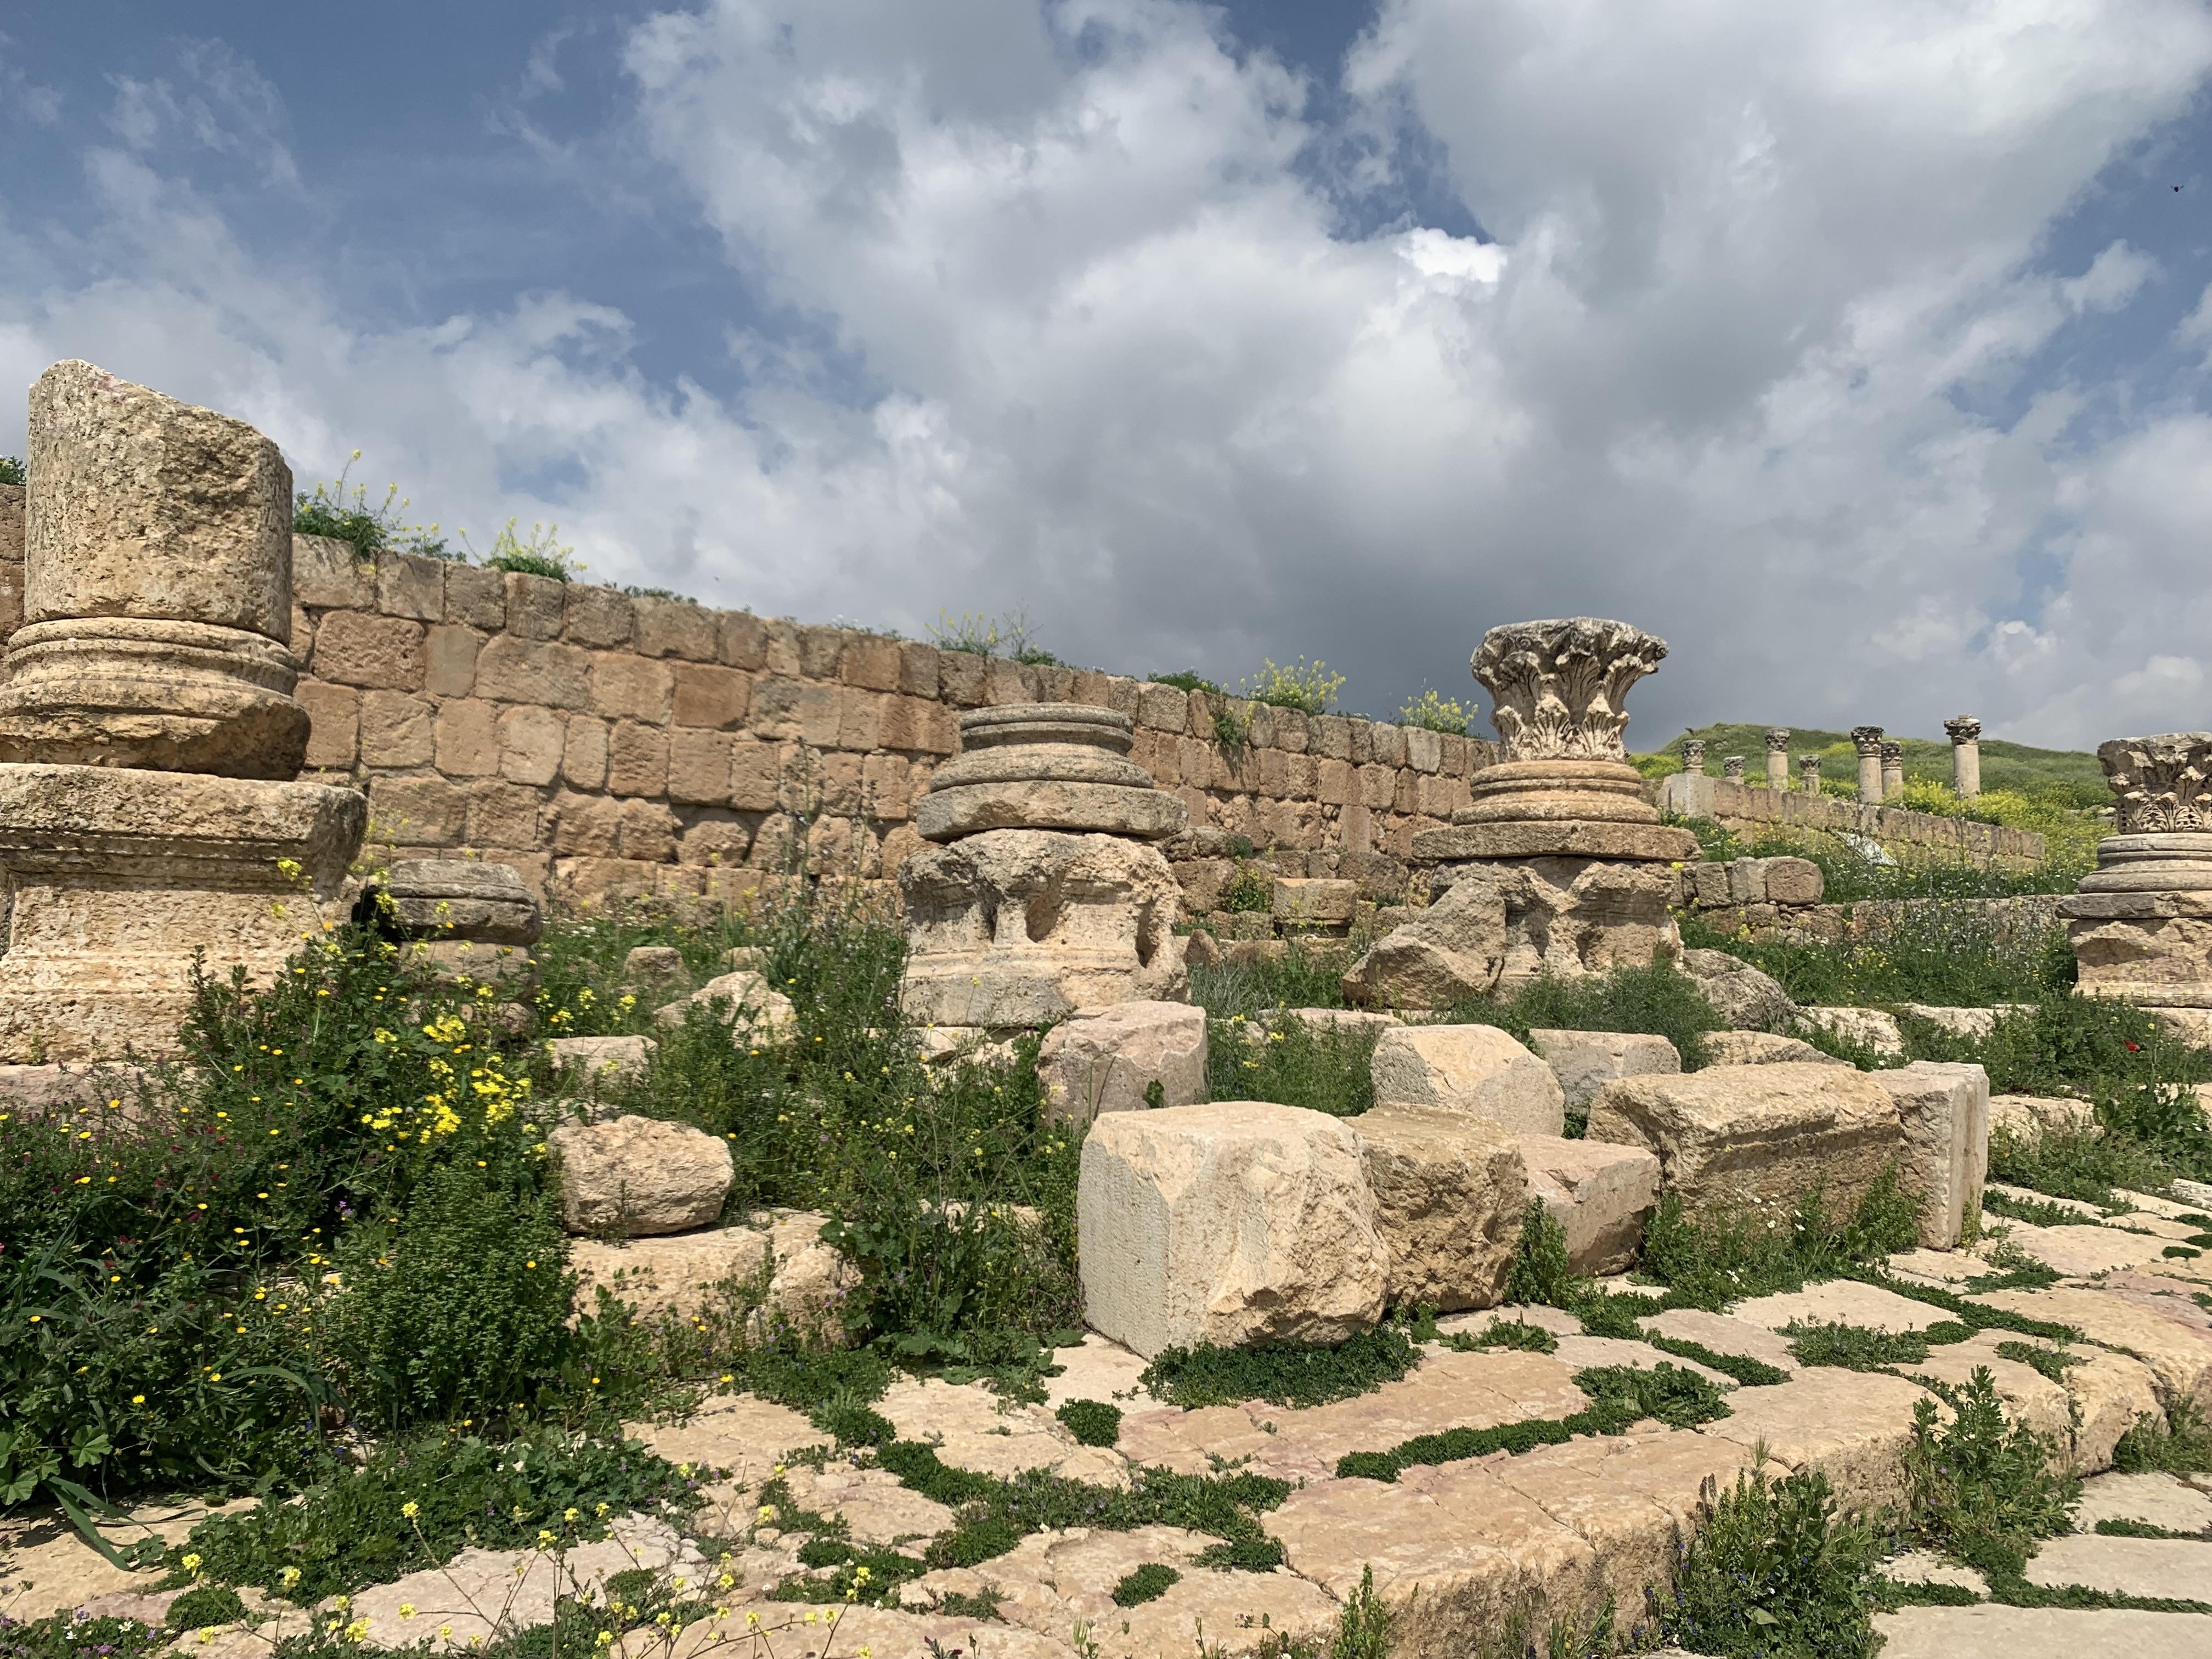 A walk through Jerash